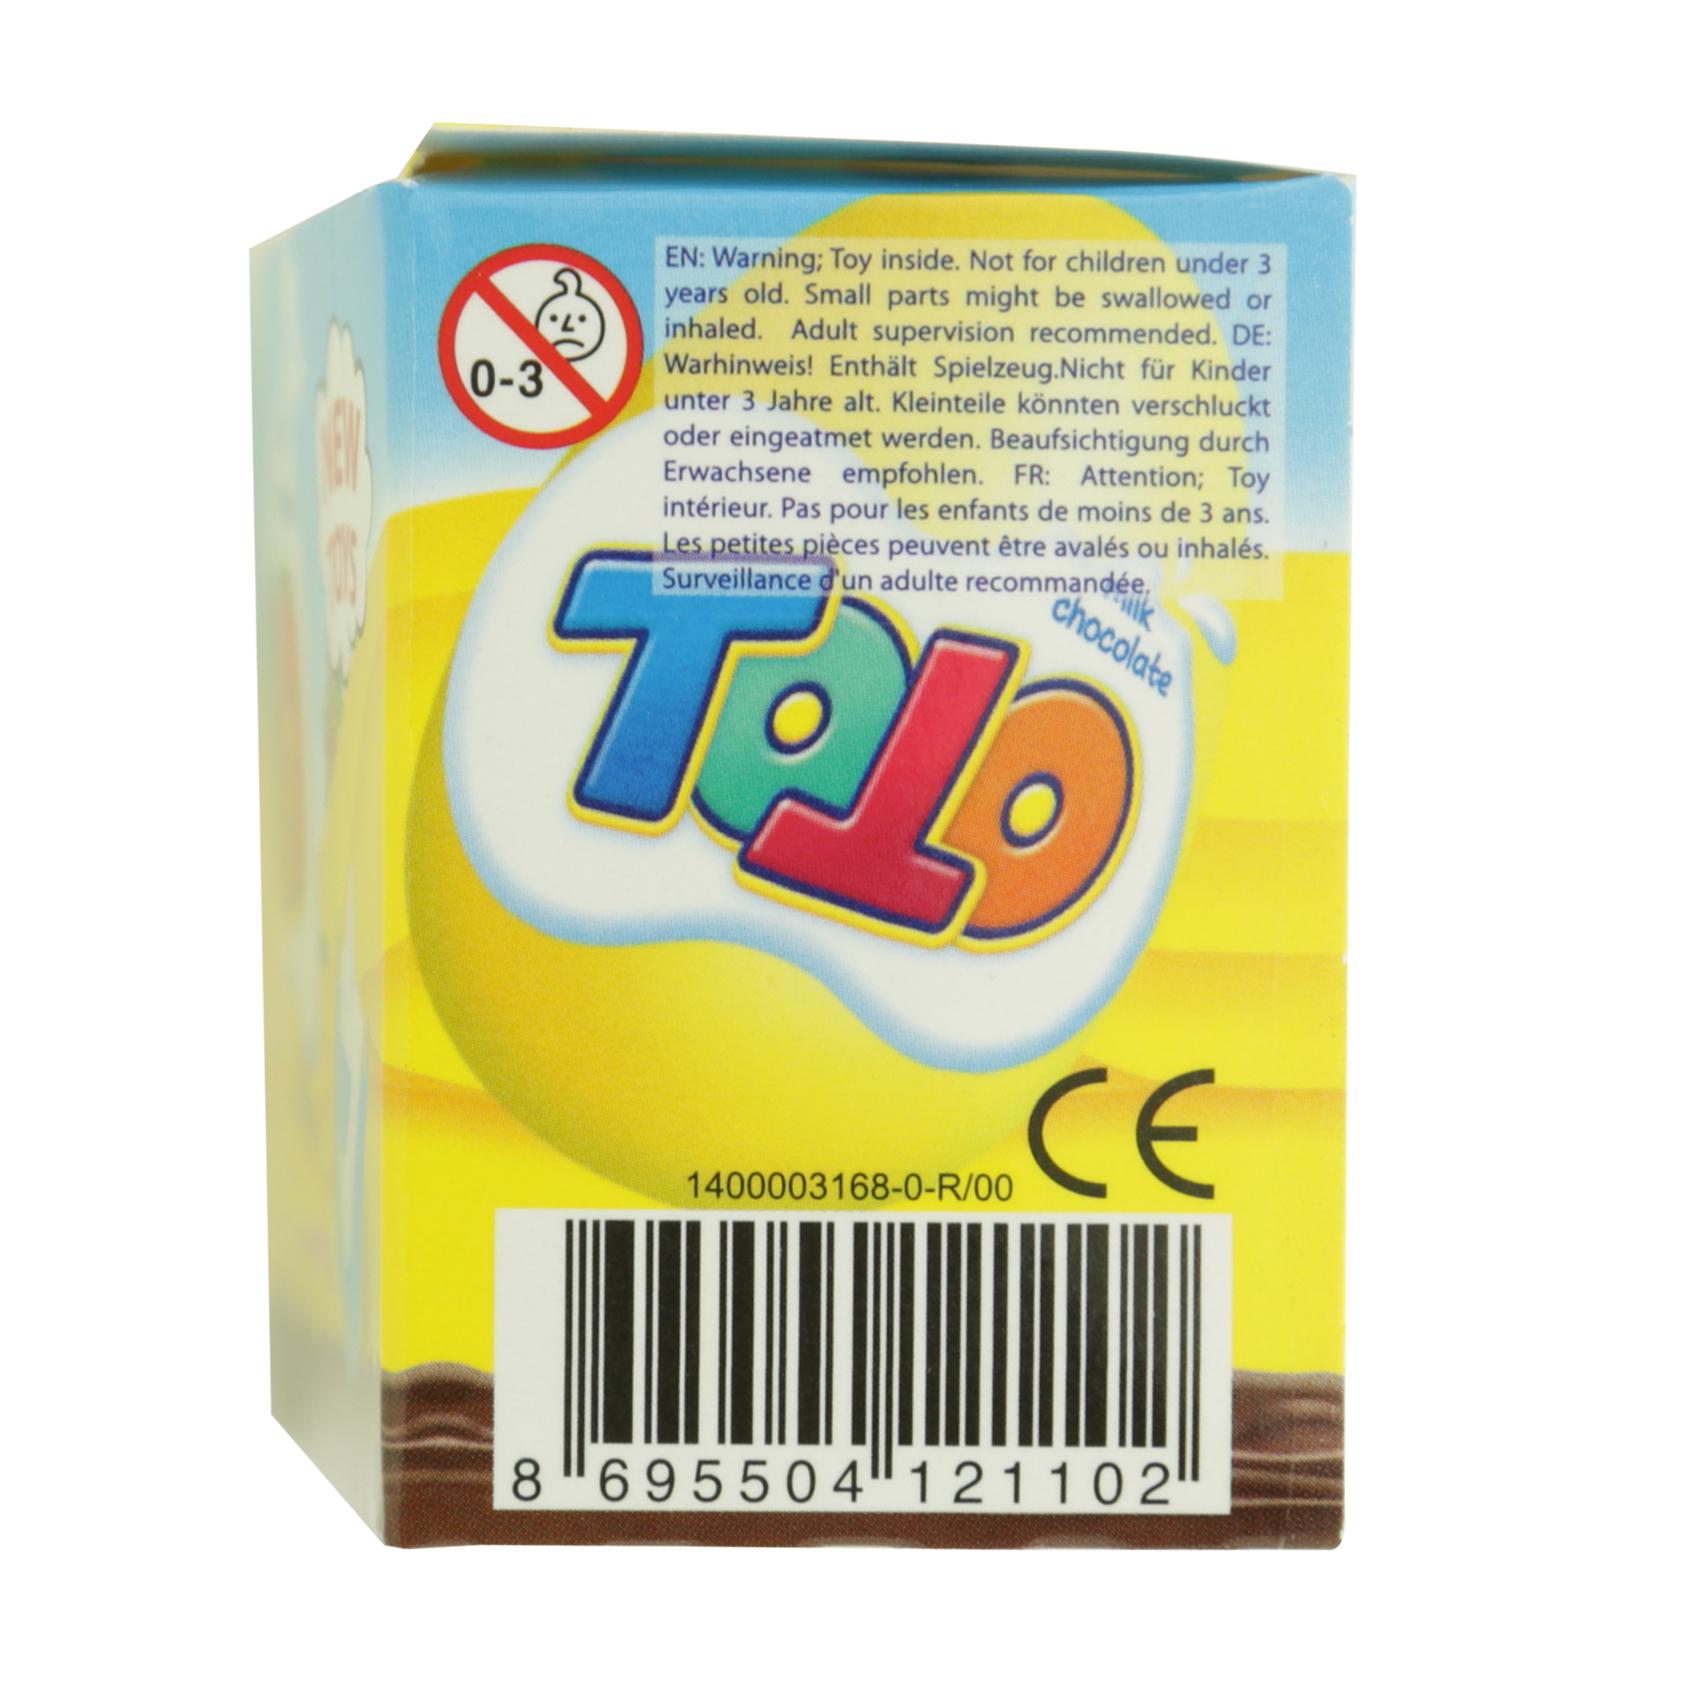 NESTLE EGG TOTO CHOCOLAT W/TOY 20GR